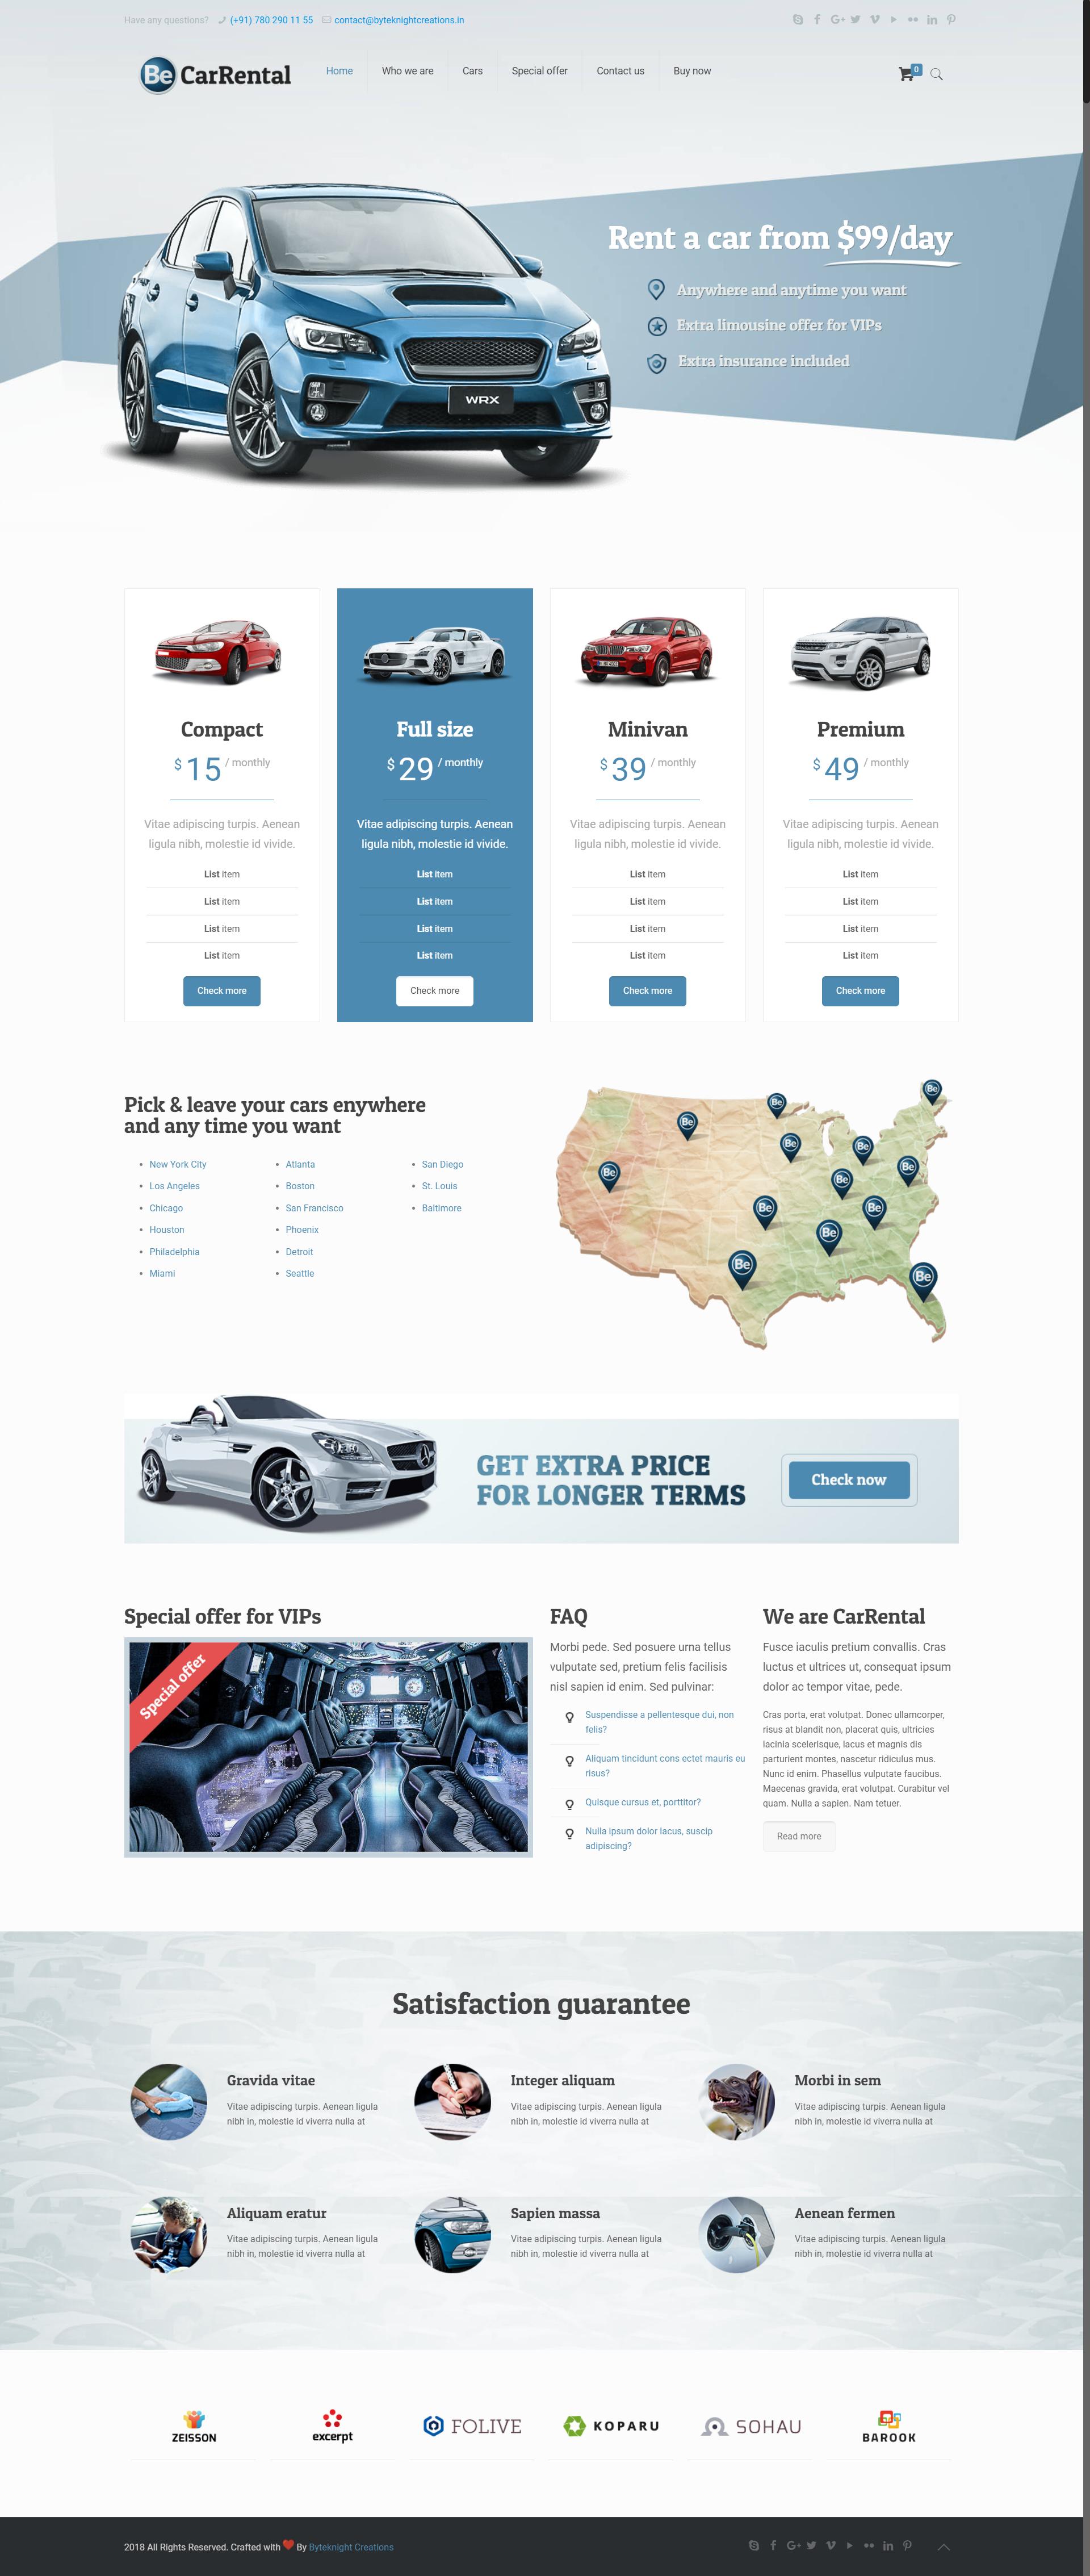 Car Rental Websites >> Web Design Themes Templates Car Rental Website Design